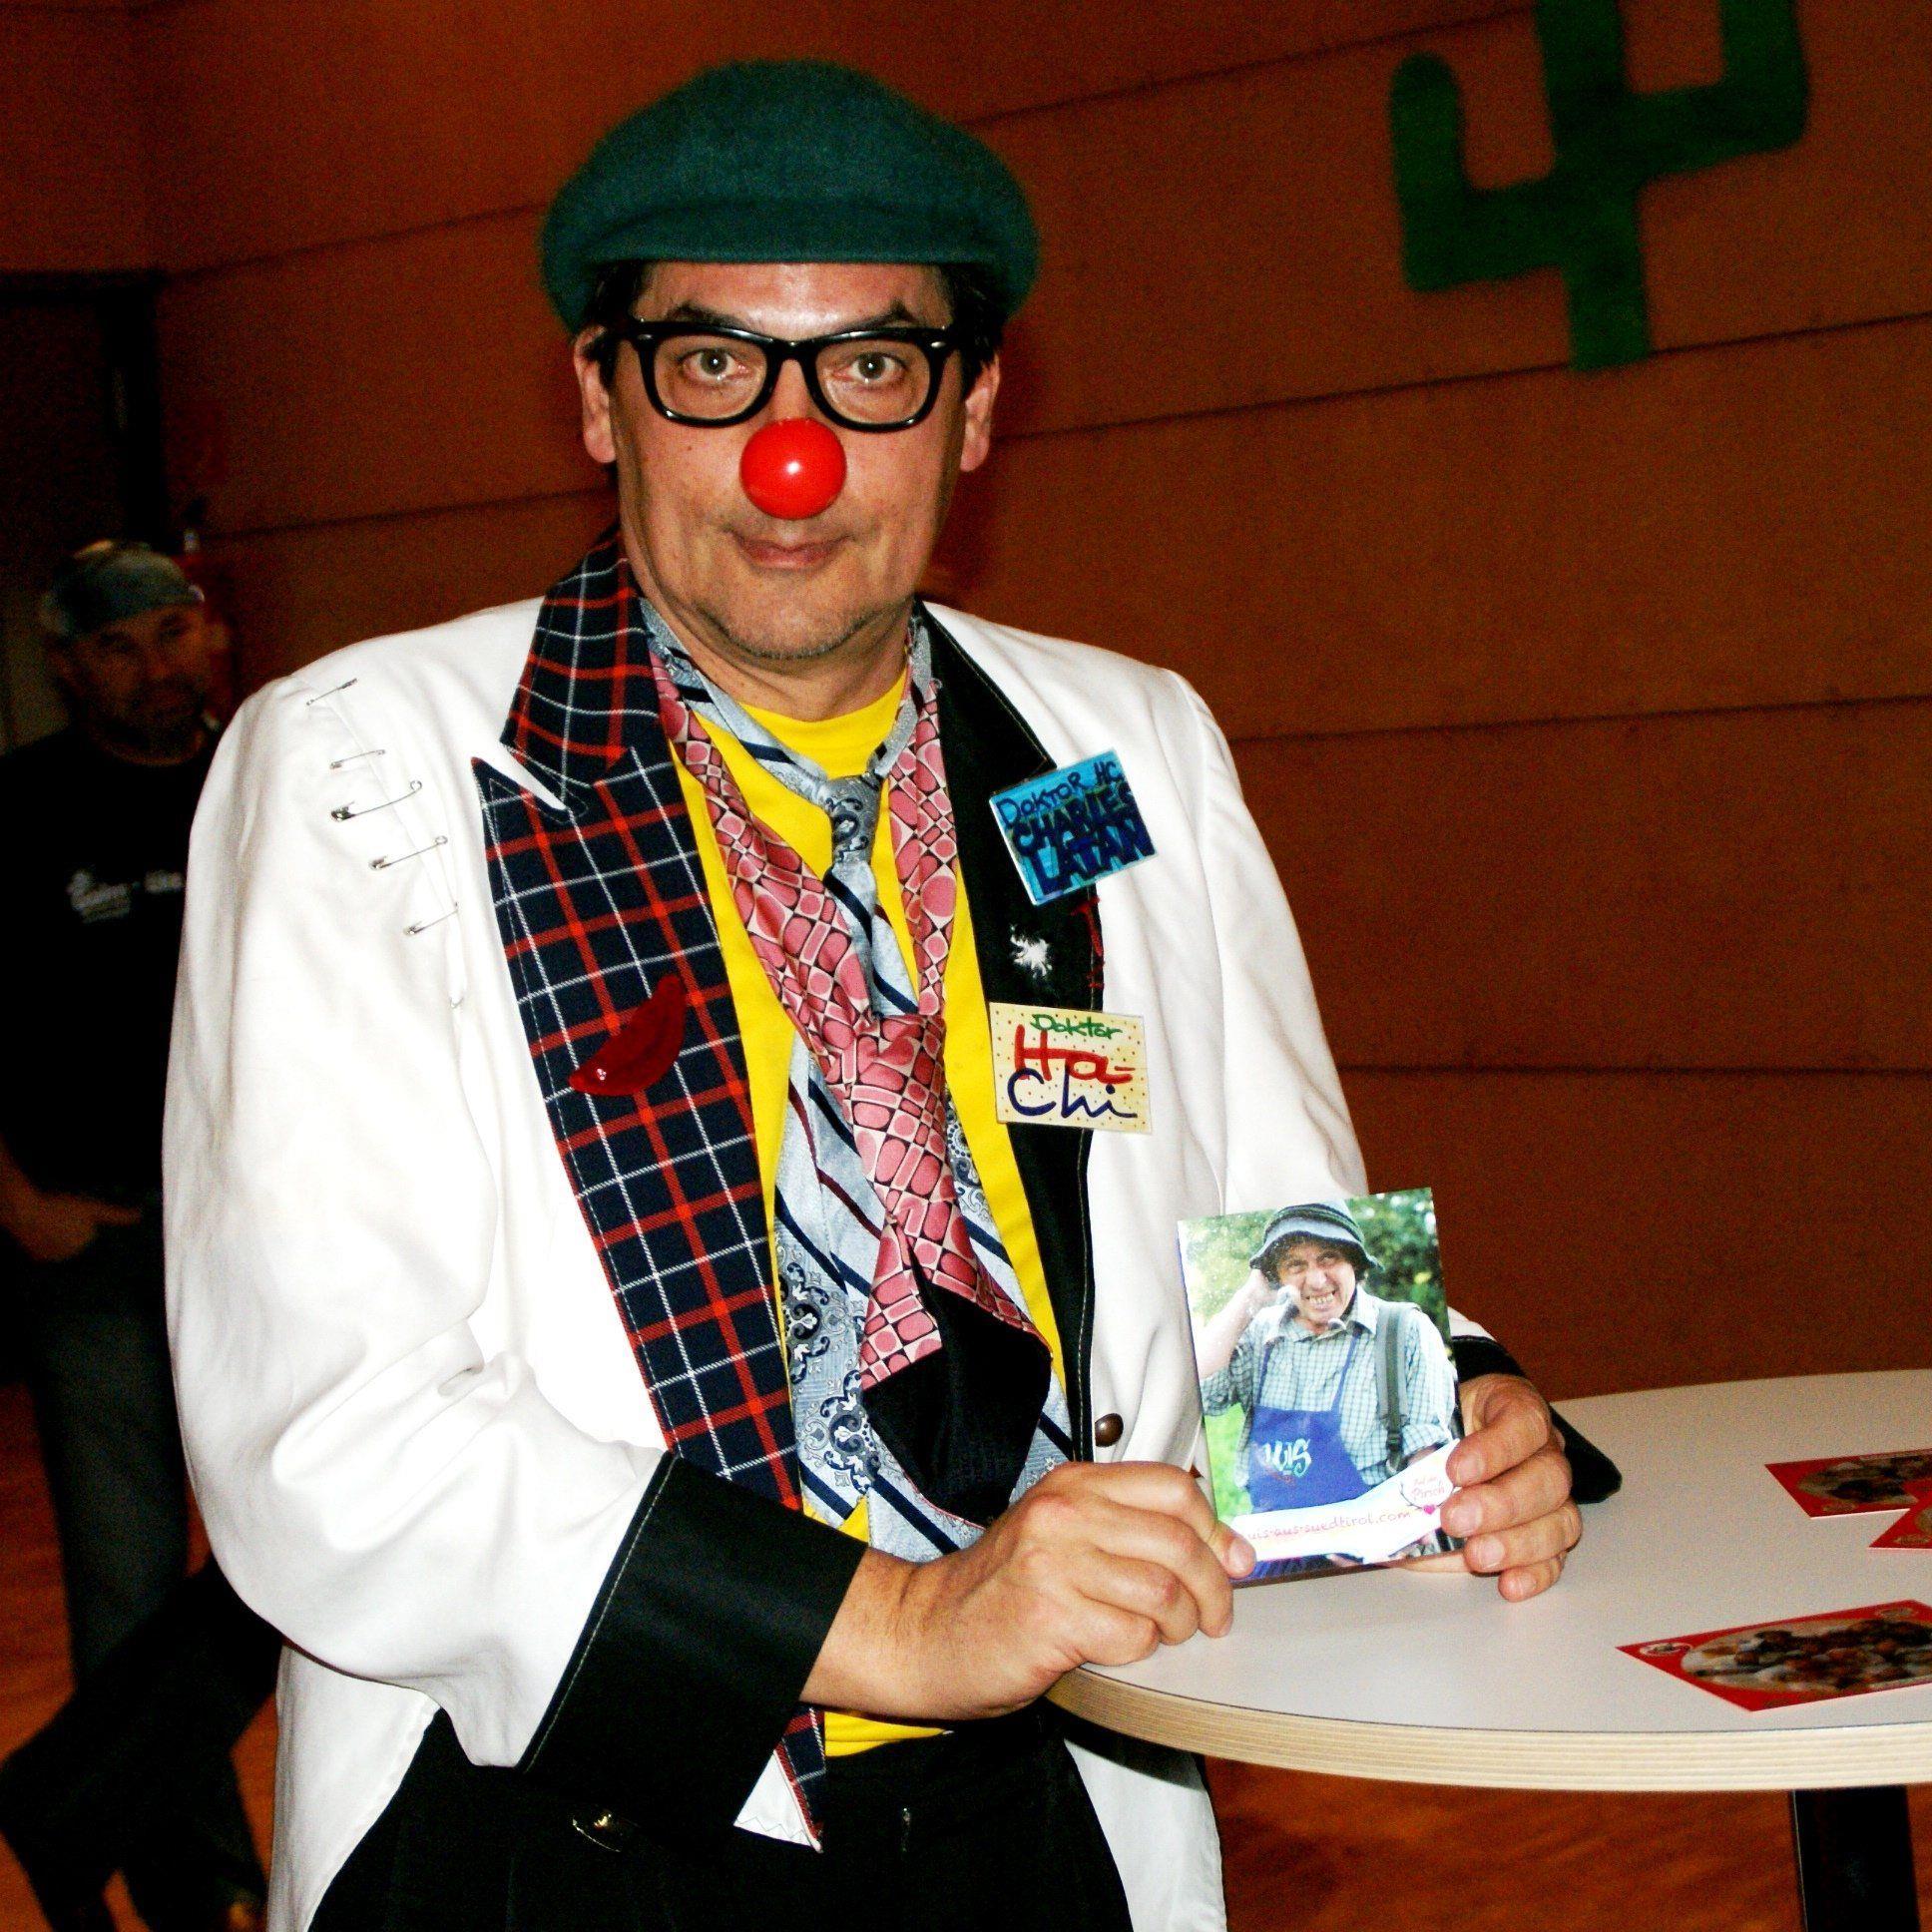 Dr. Hatchi, alias Dr. Charlatan